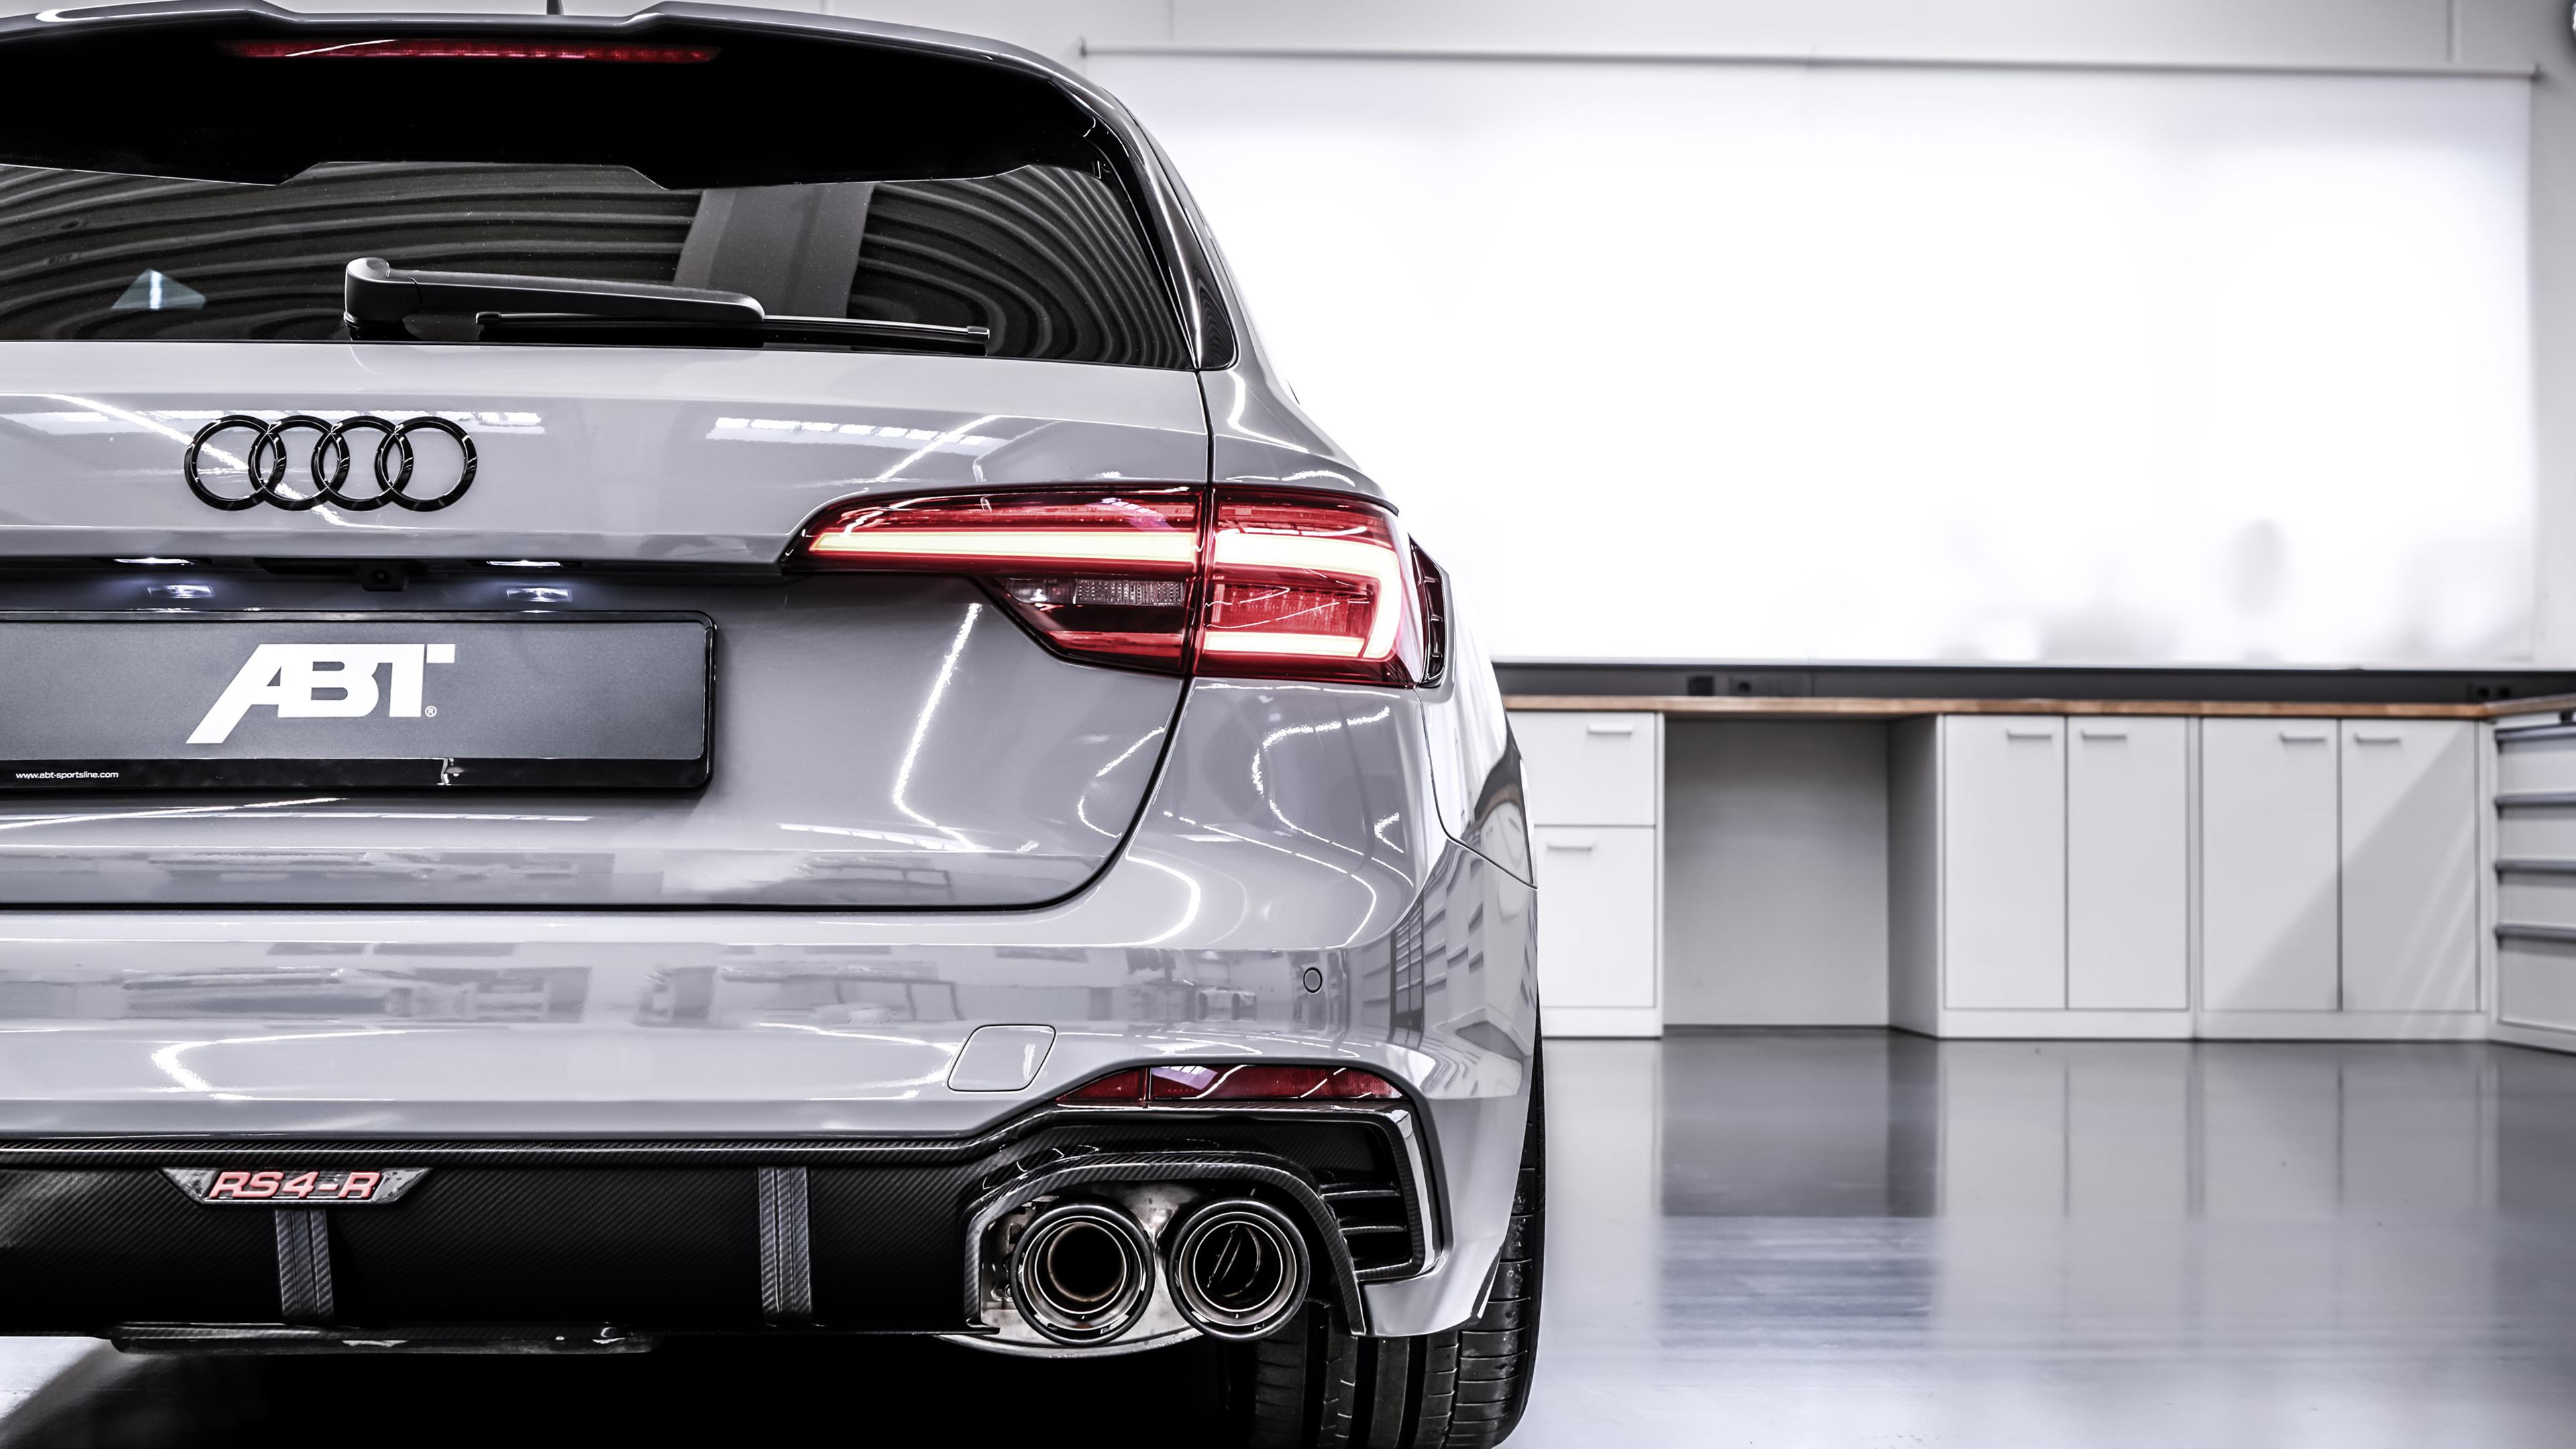 Maserati Wallpaper Iphone X 2018 Abt Audi Rs4 R Avant 4k 2 Wallpaper Hd Car